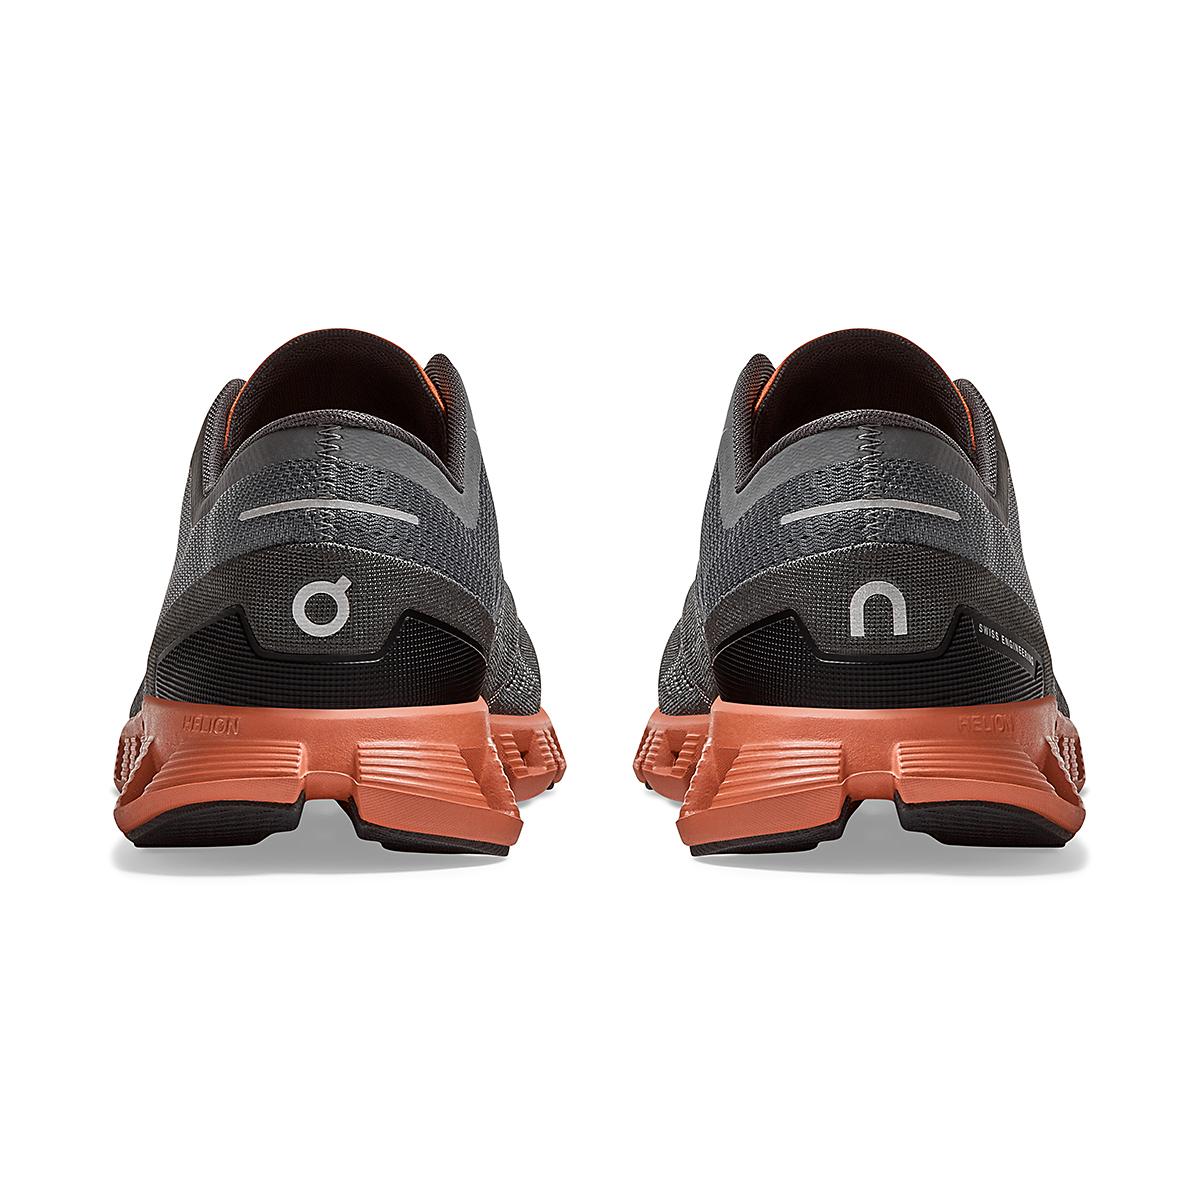 Men's On Cloud X 2.0 Training Shoe - Color: Rust/Rock - Size: 7 - Width: Regular, Rust/Rock, large, image 4